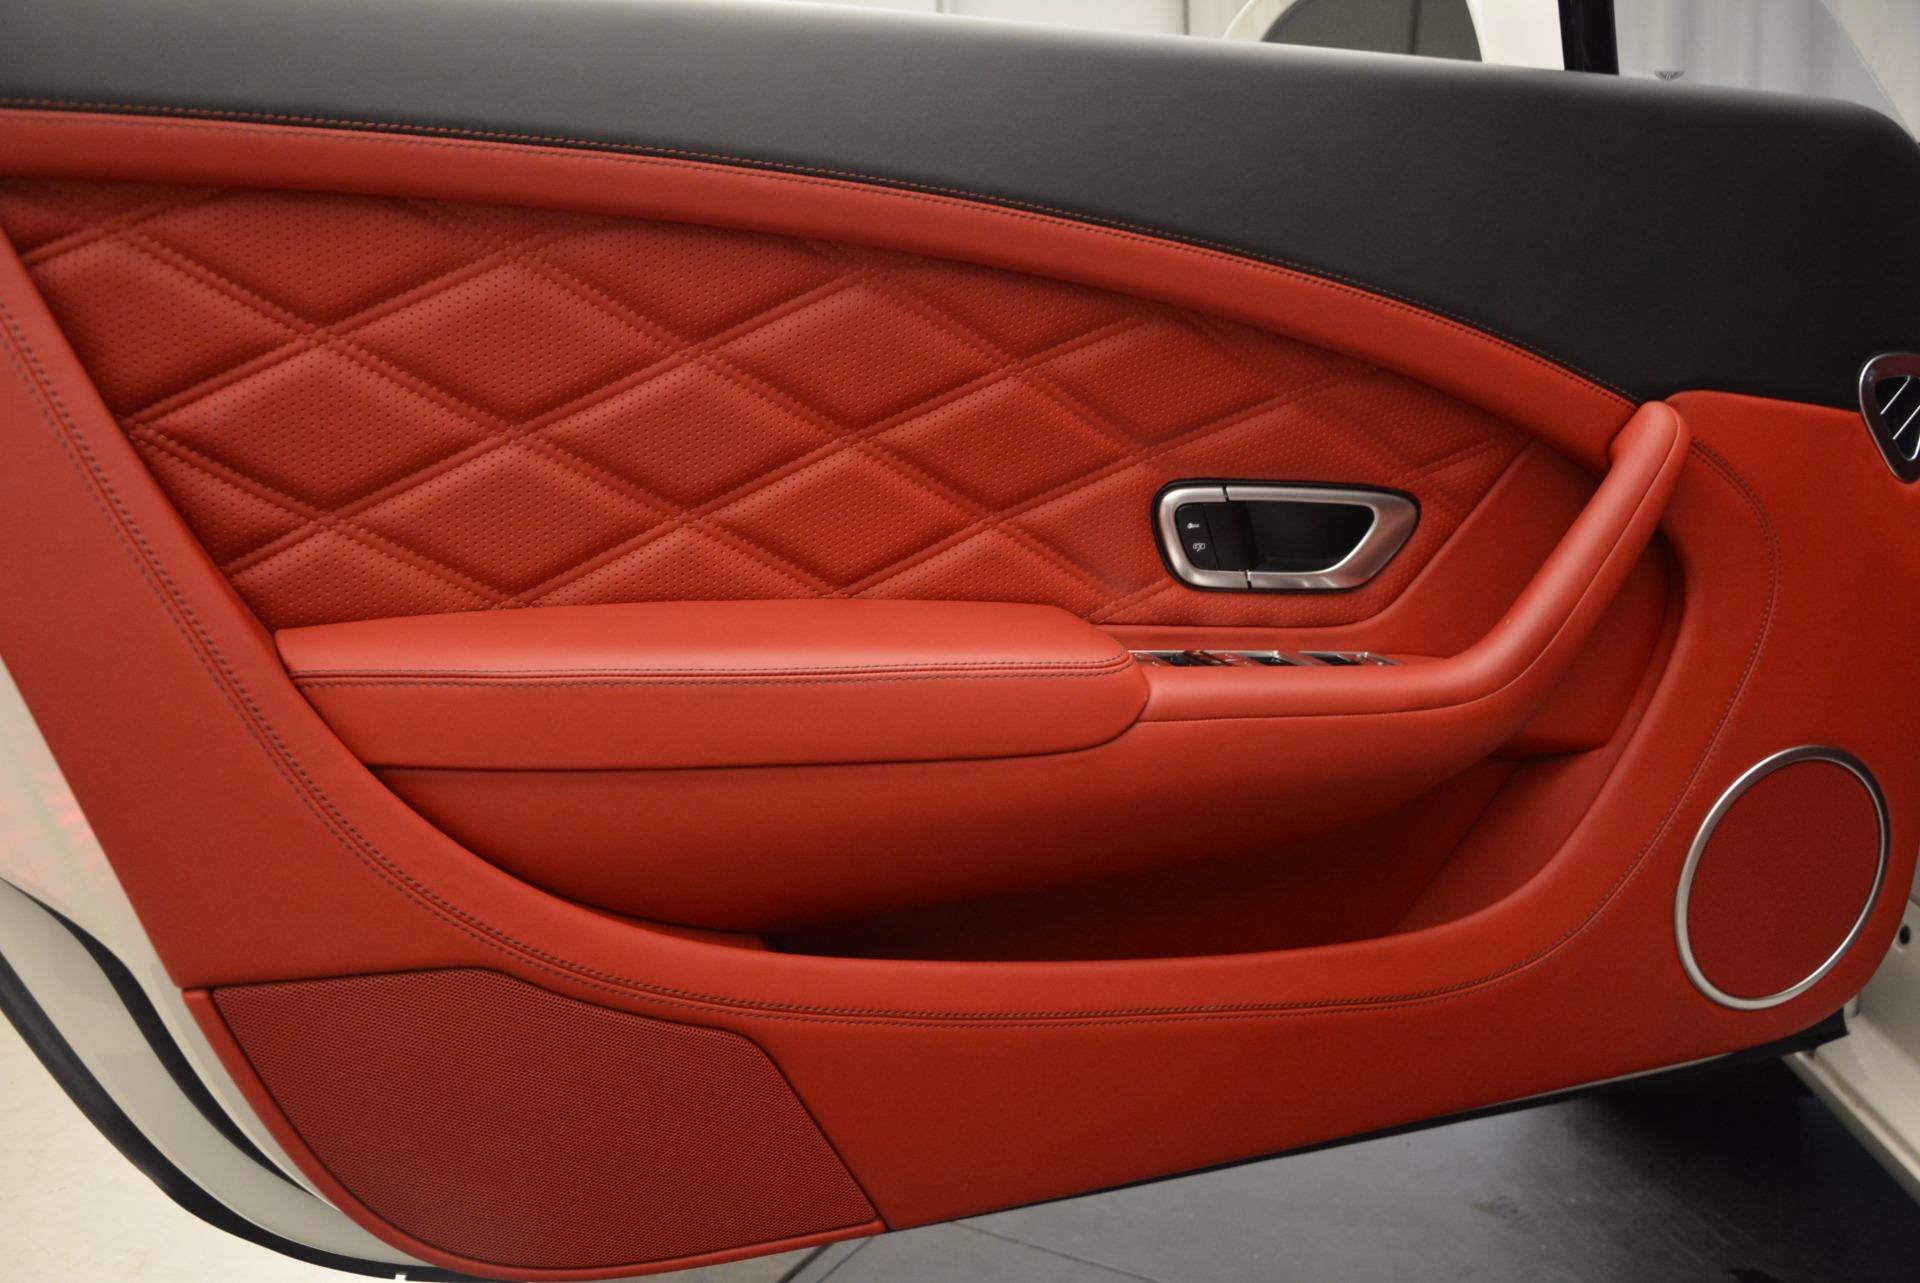 Used 2014 Bentley Continental GT Speed For Sale In Westport, CT 1102_p20